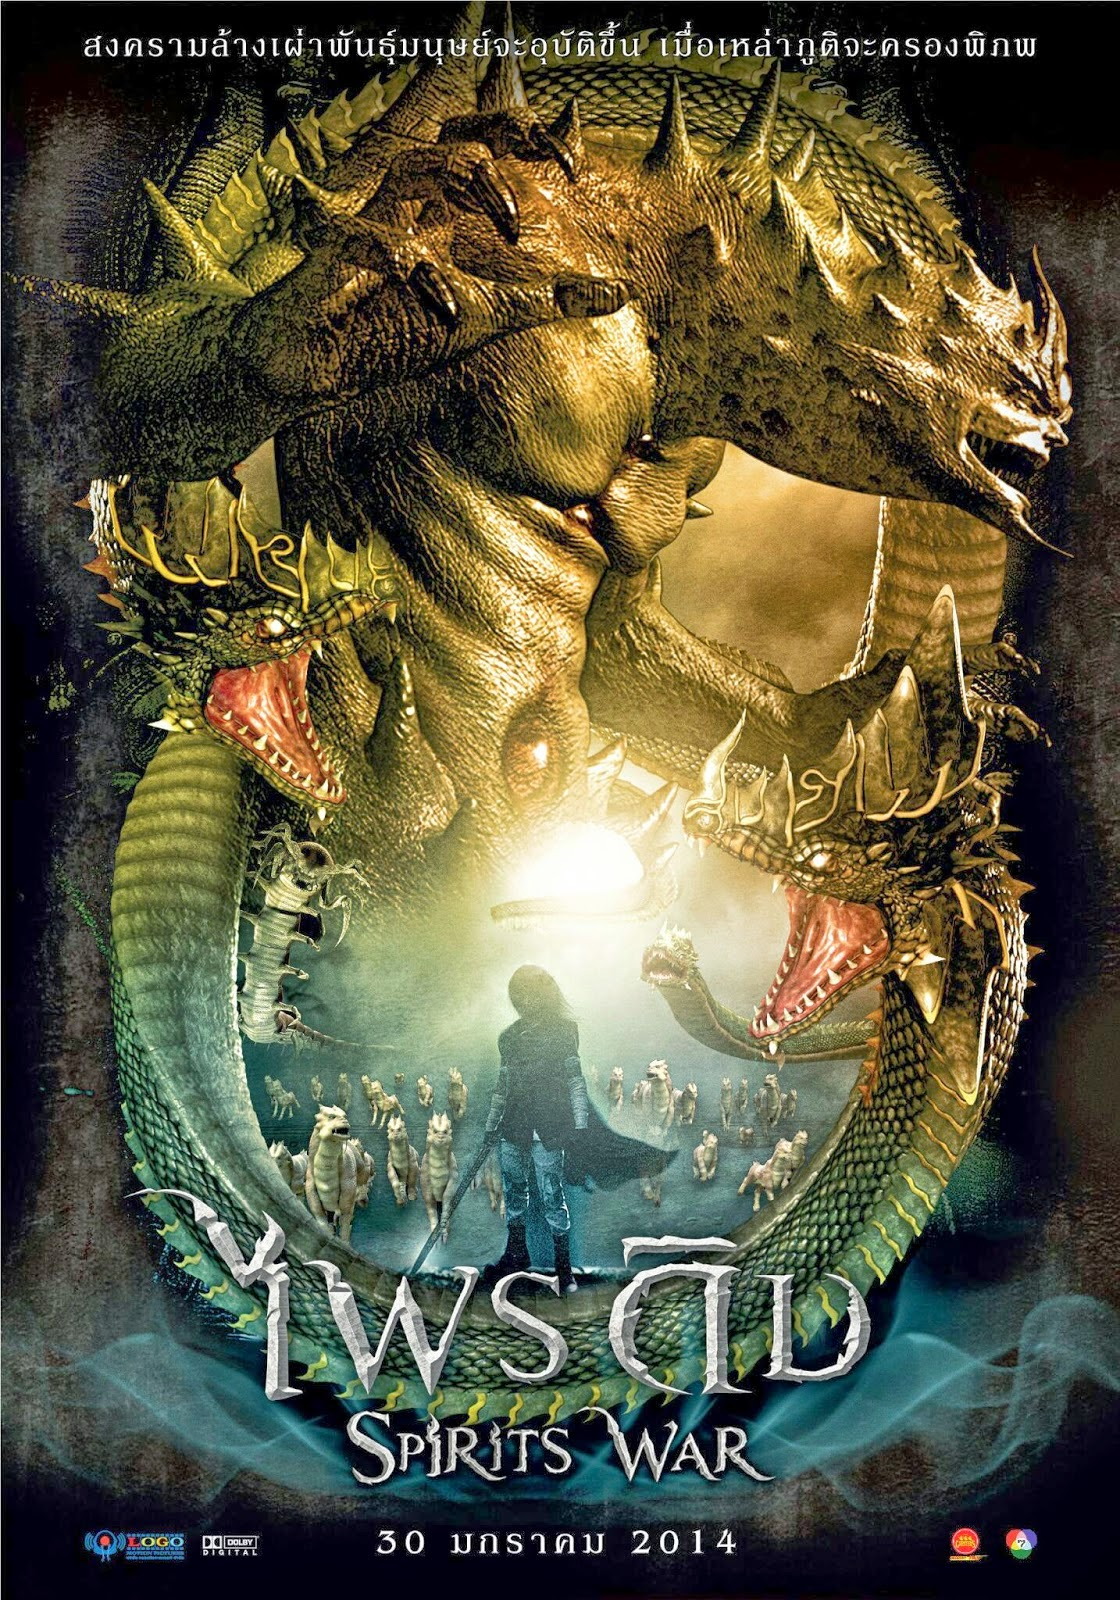 xem phim Thợ Săn Linh Hồn - Spirit War 2014 full hd vietsub online poster